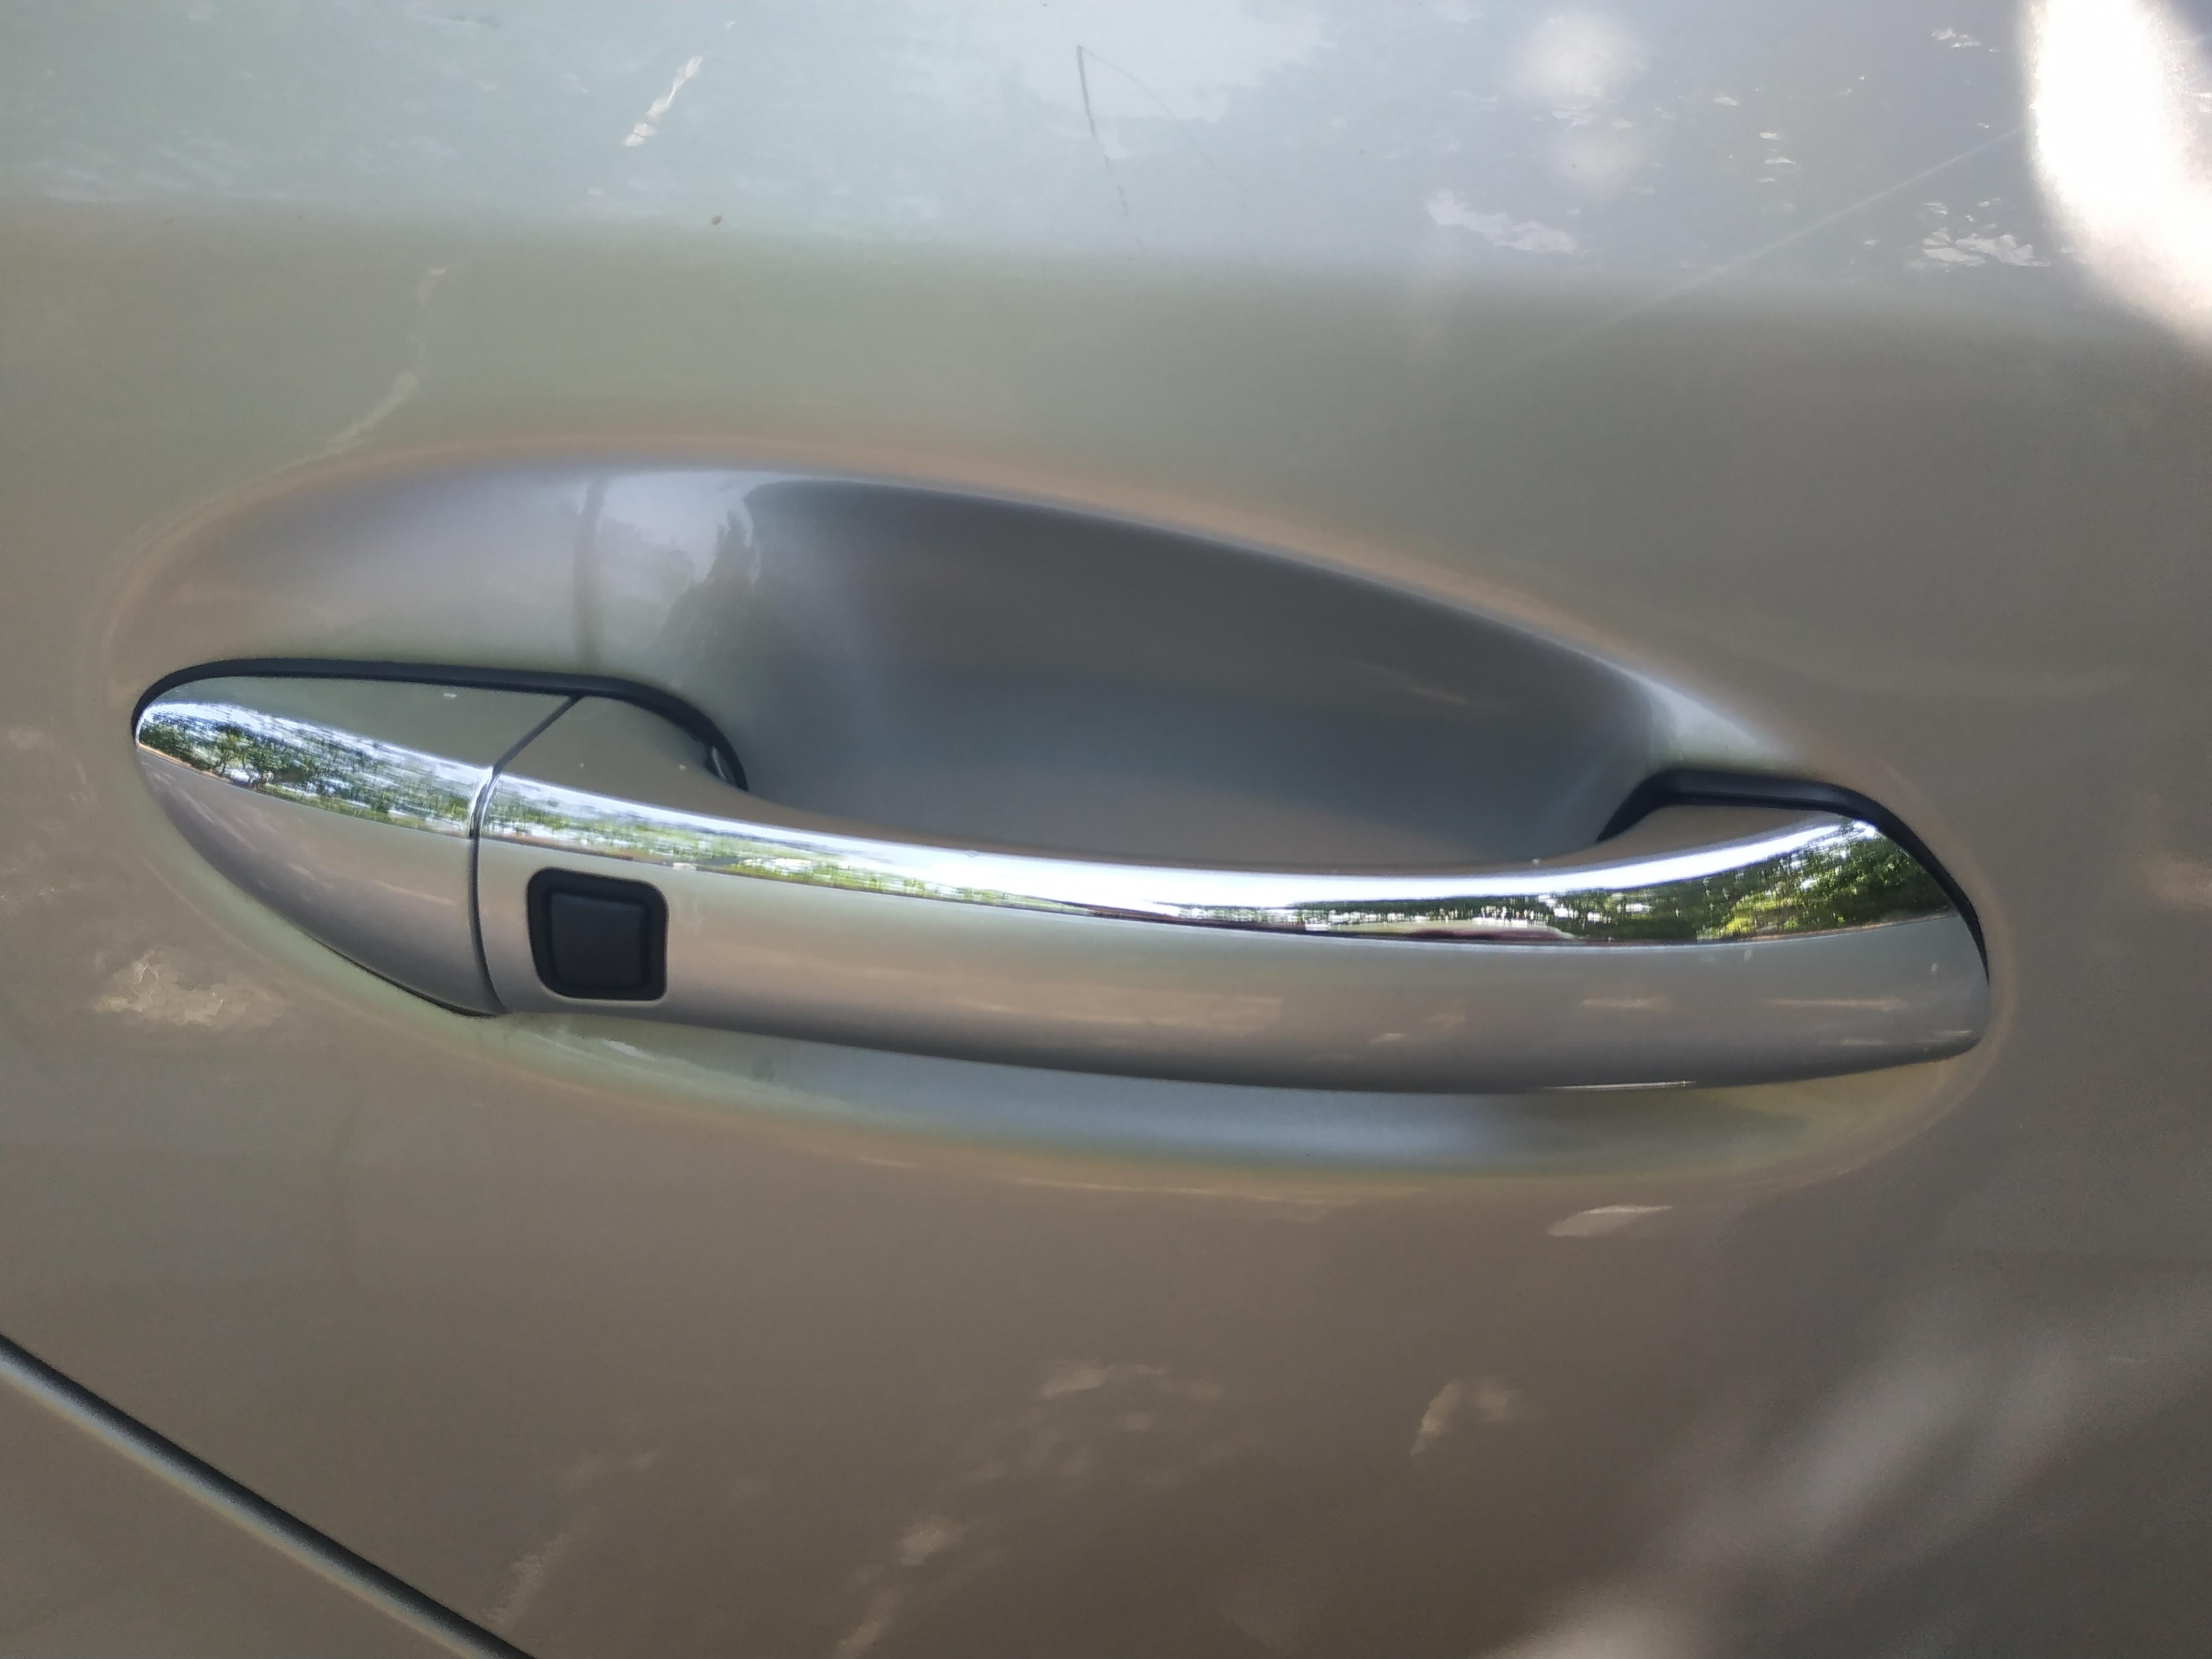 Mercedes-Benz E 350 3.5(lt) 2006 İkinci əl  $12500